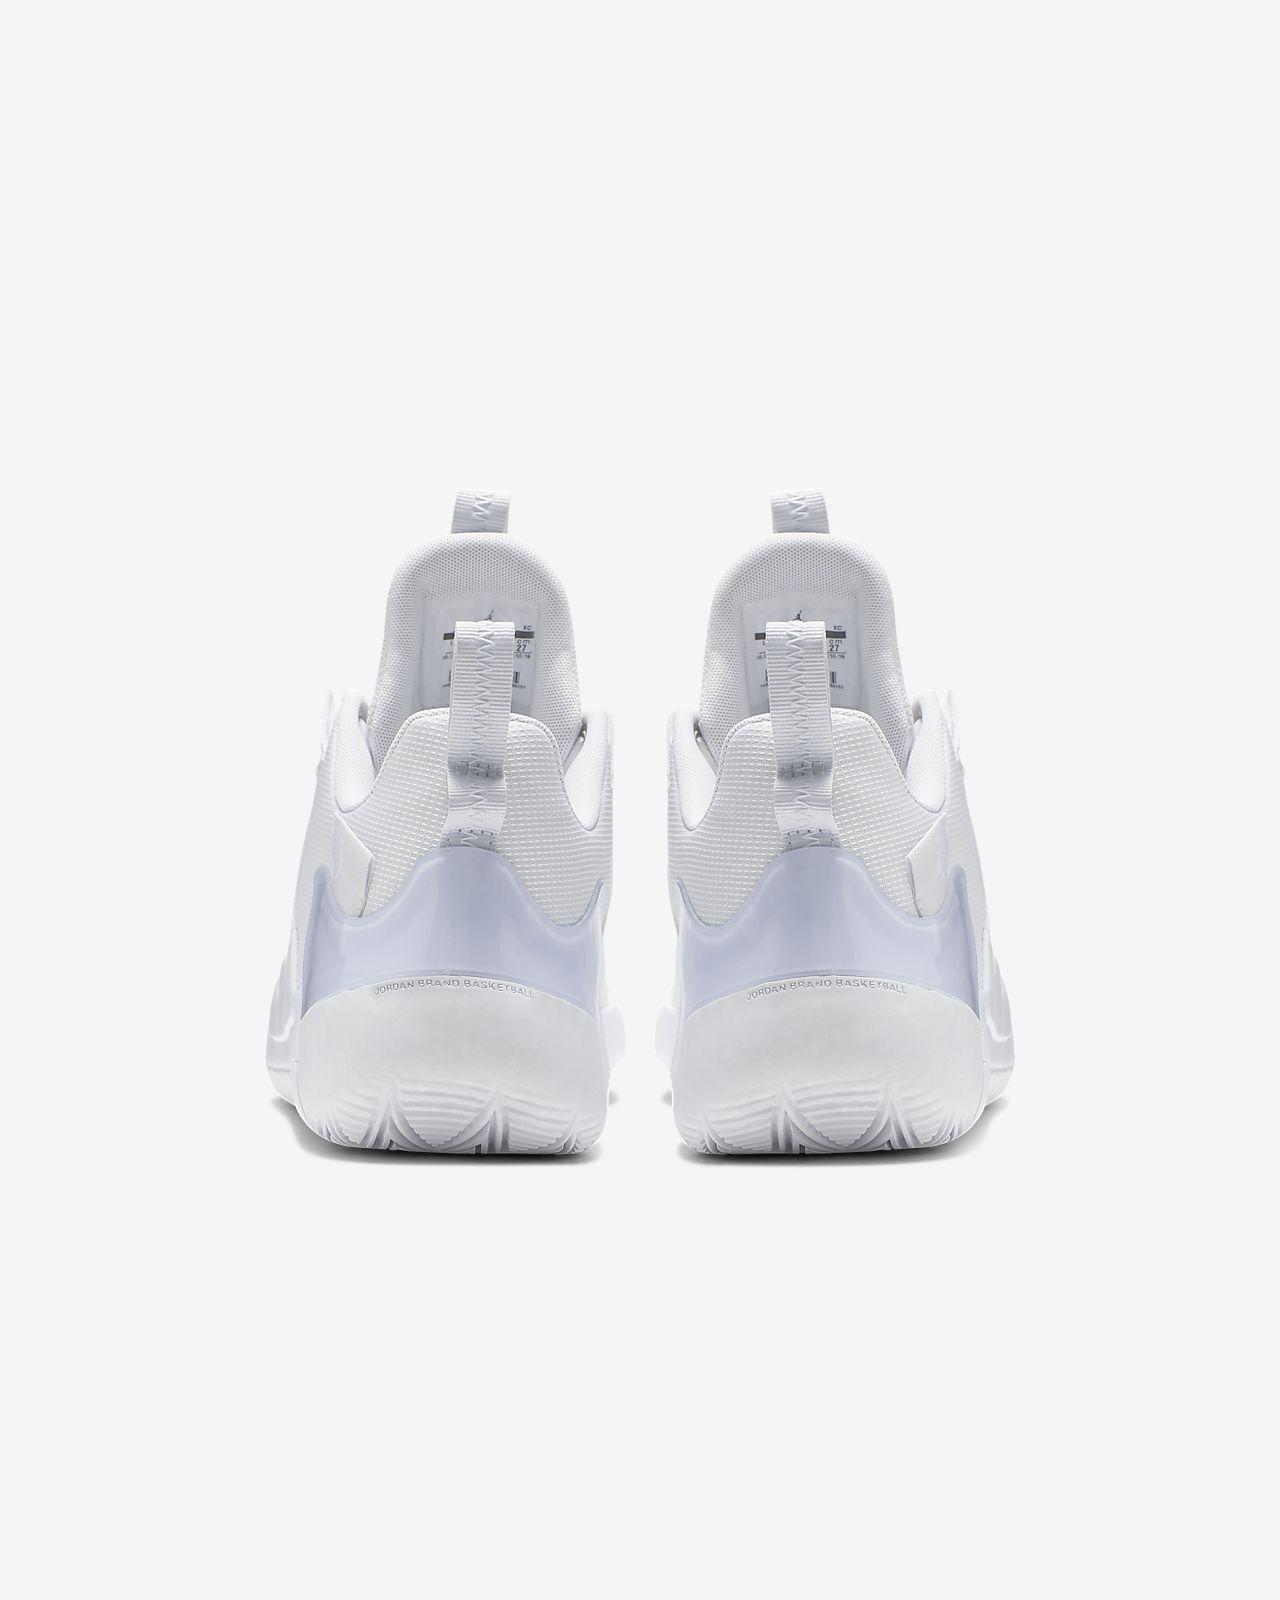 0540db1b6f8 Jordan Zoom Zero Gravity Basketball Shoe. Nike.com CA